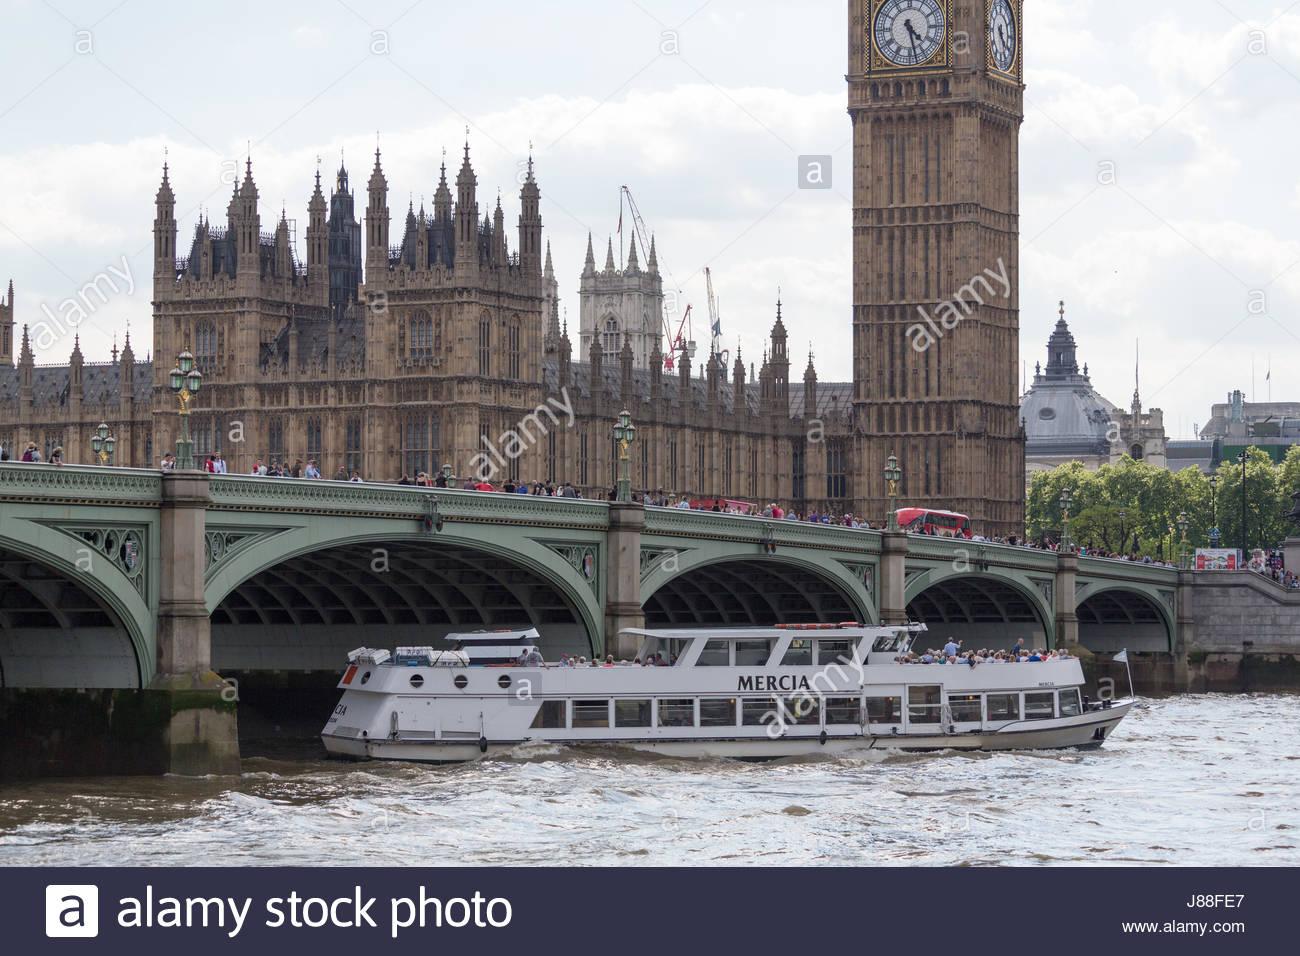 Passenger vessel Mercia sailing under Westminster bridge - Stock Image